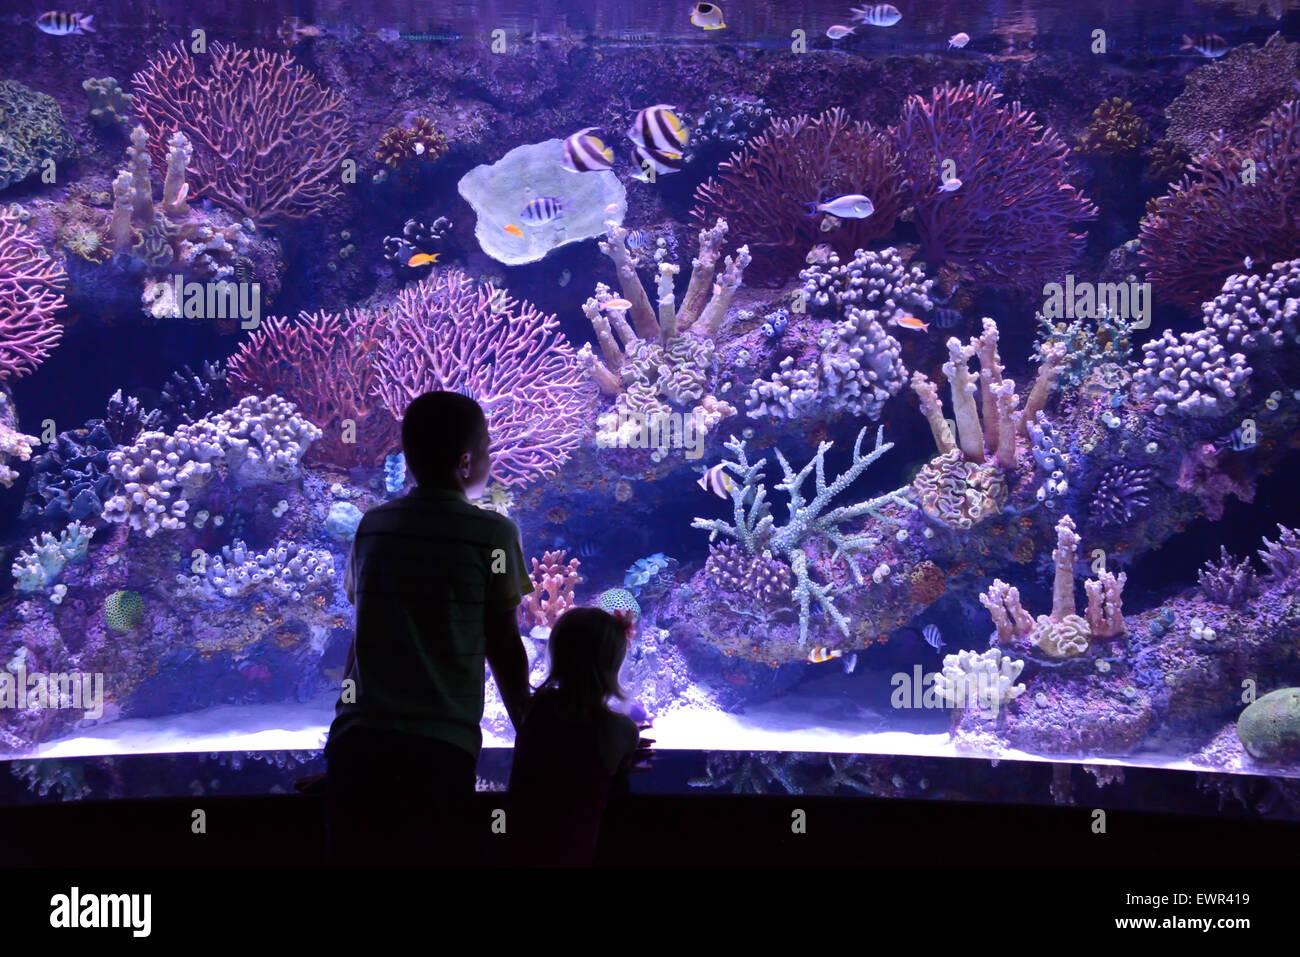 Les gens regardent un grand aquarium Photo Stock